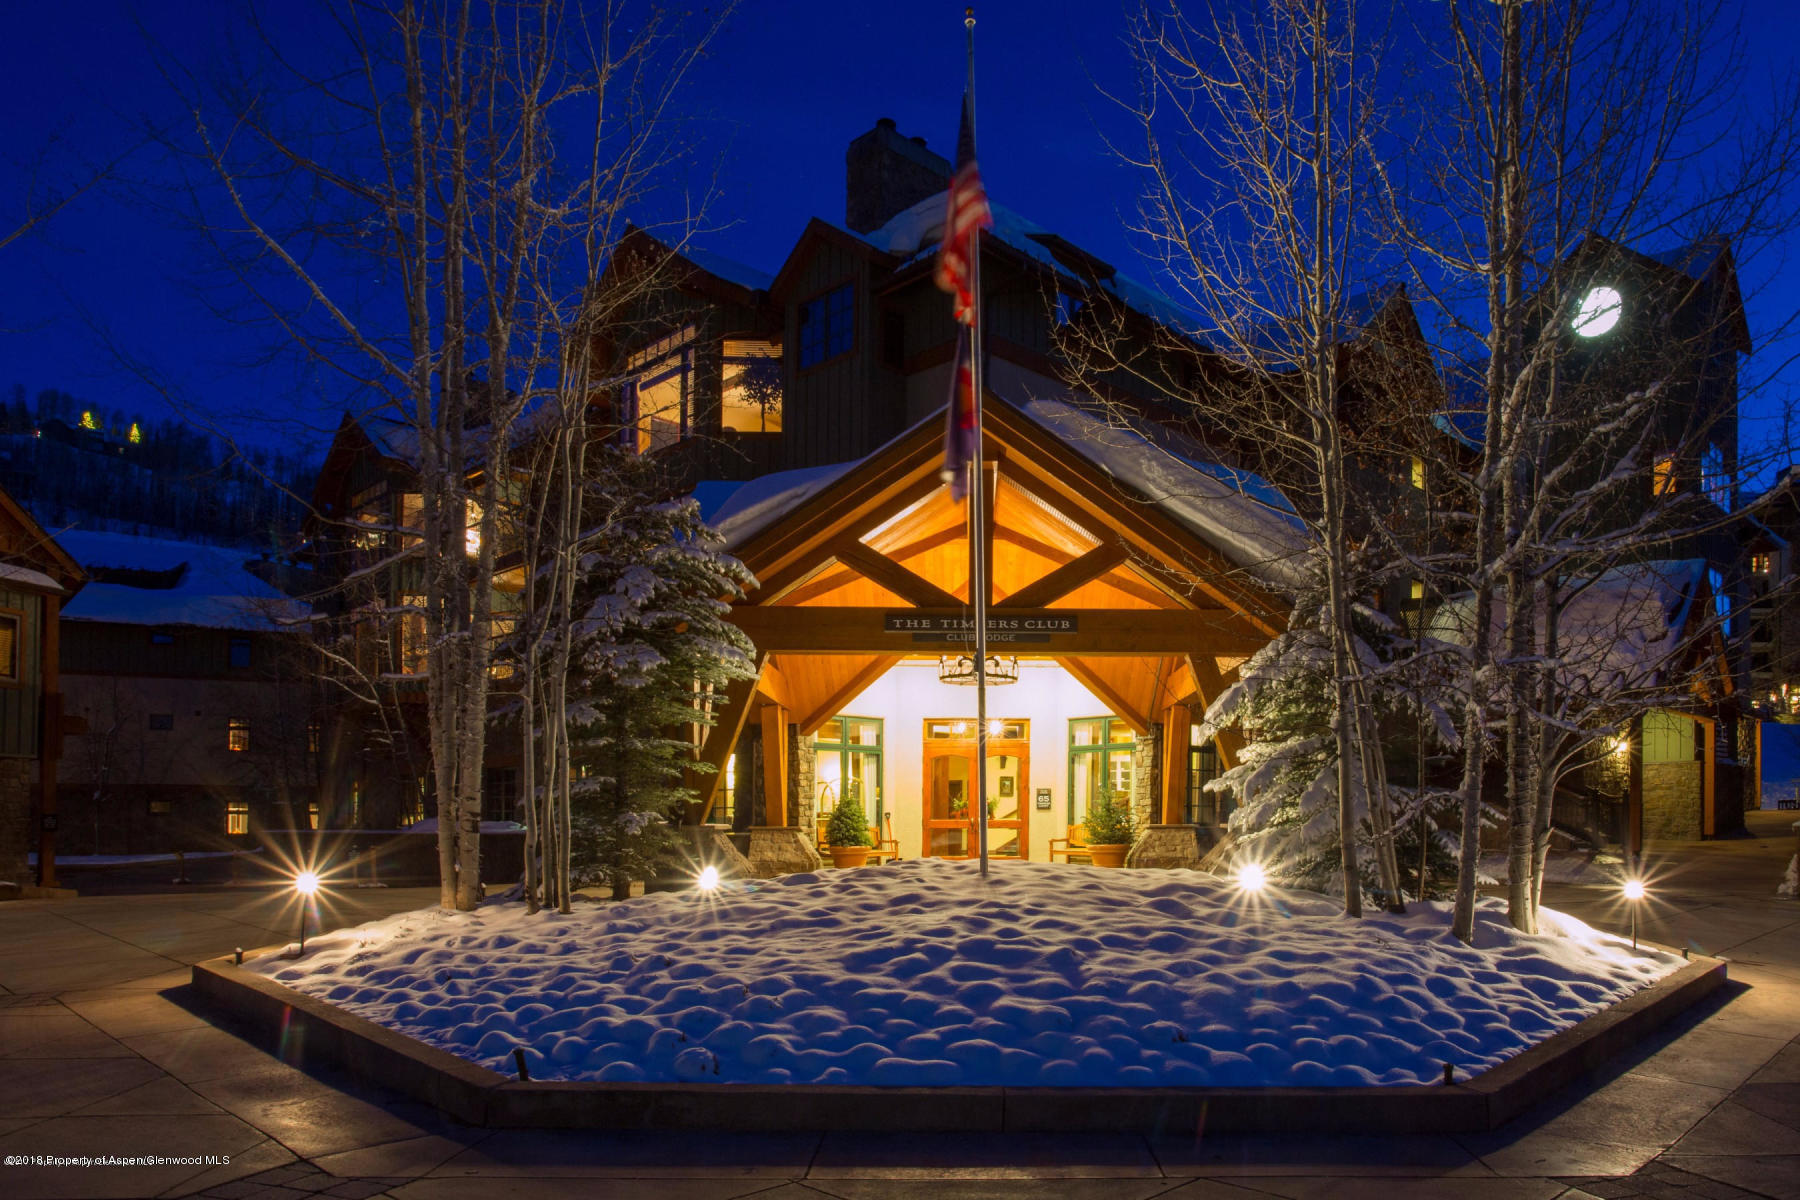 115 Timbers Club Court - Snowmass Village, Colorado